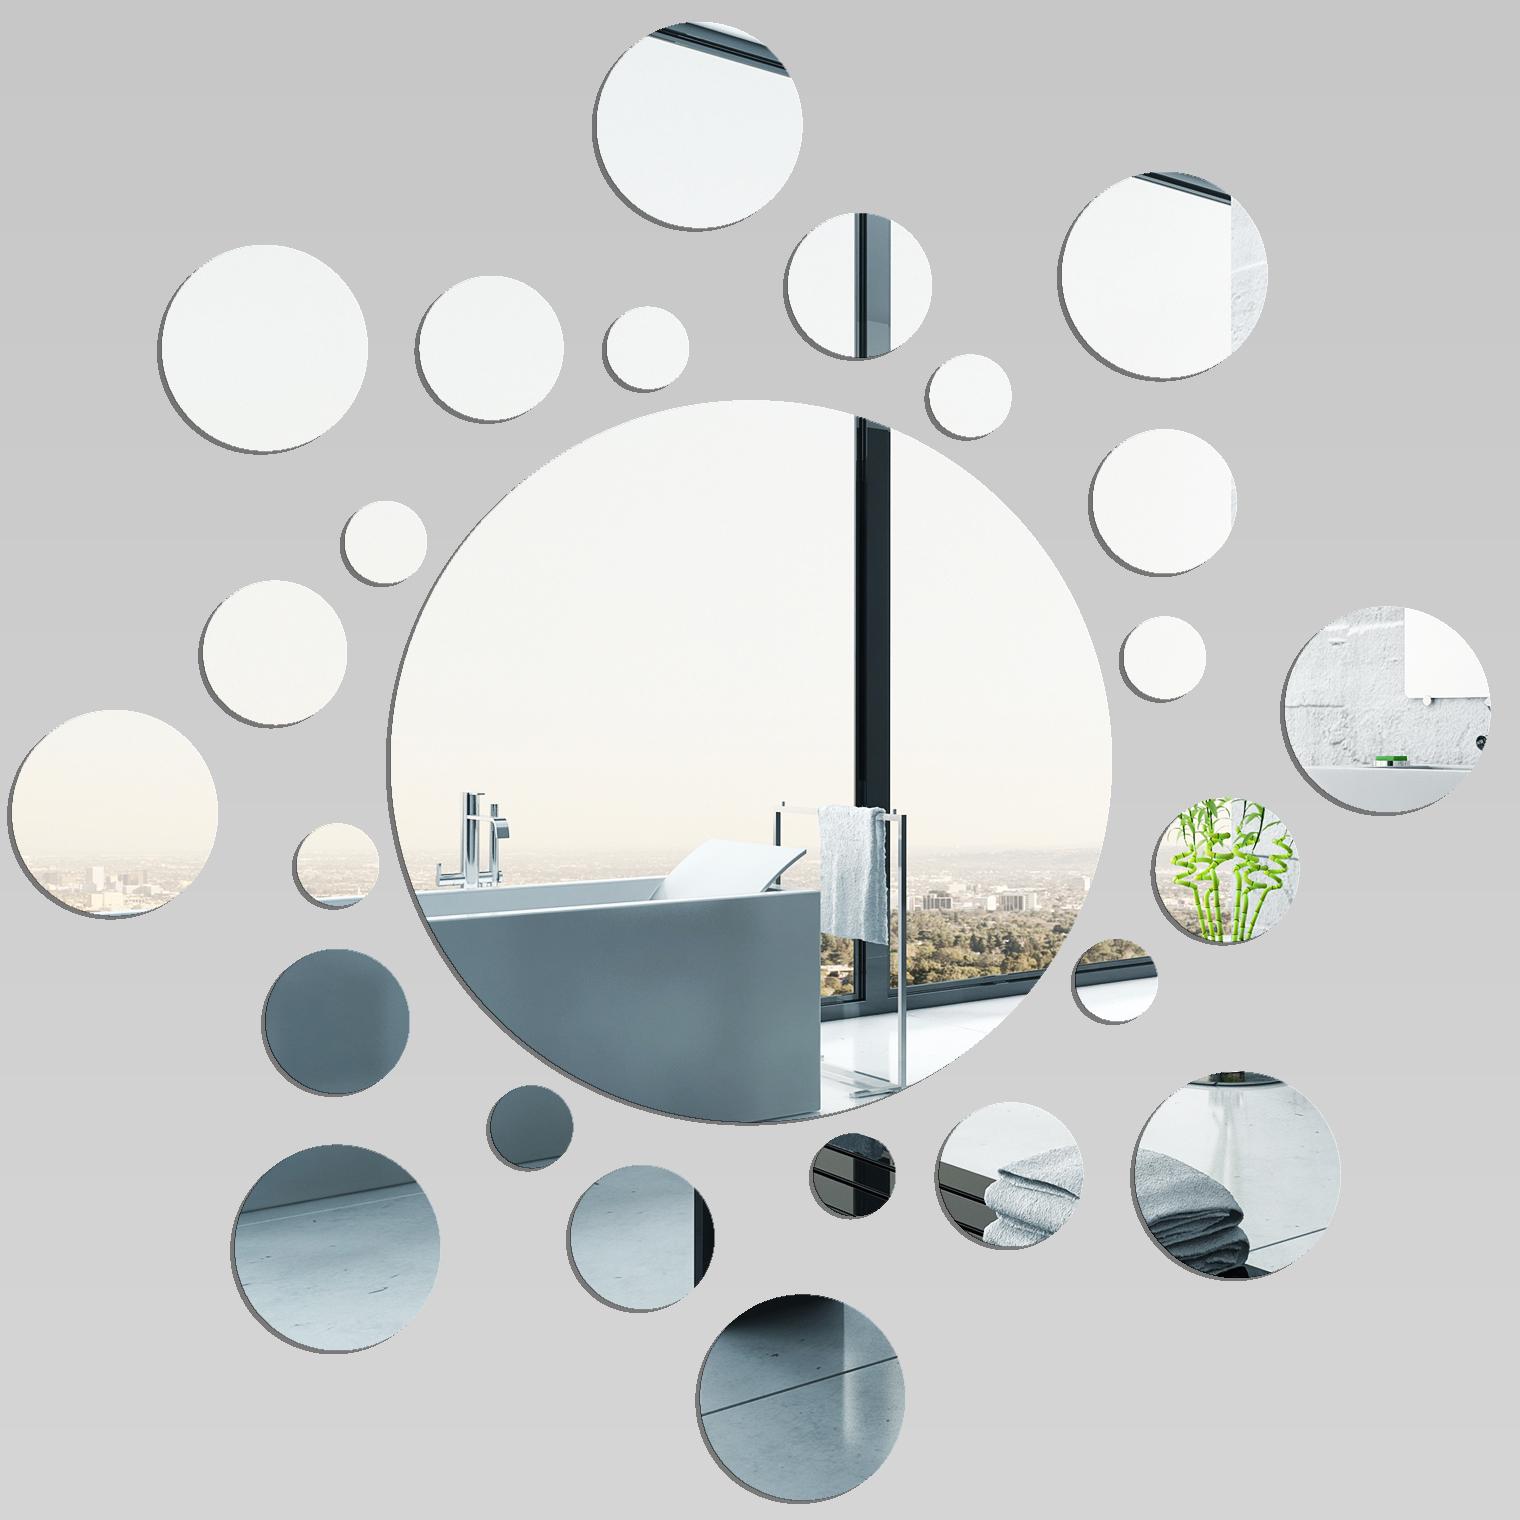 Adesivi follia specchio acrilico plexiglass spirale for Modelos de espejos decorativos